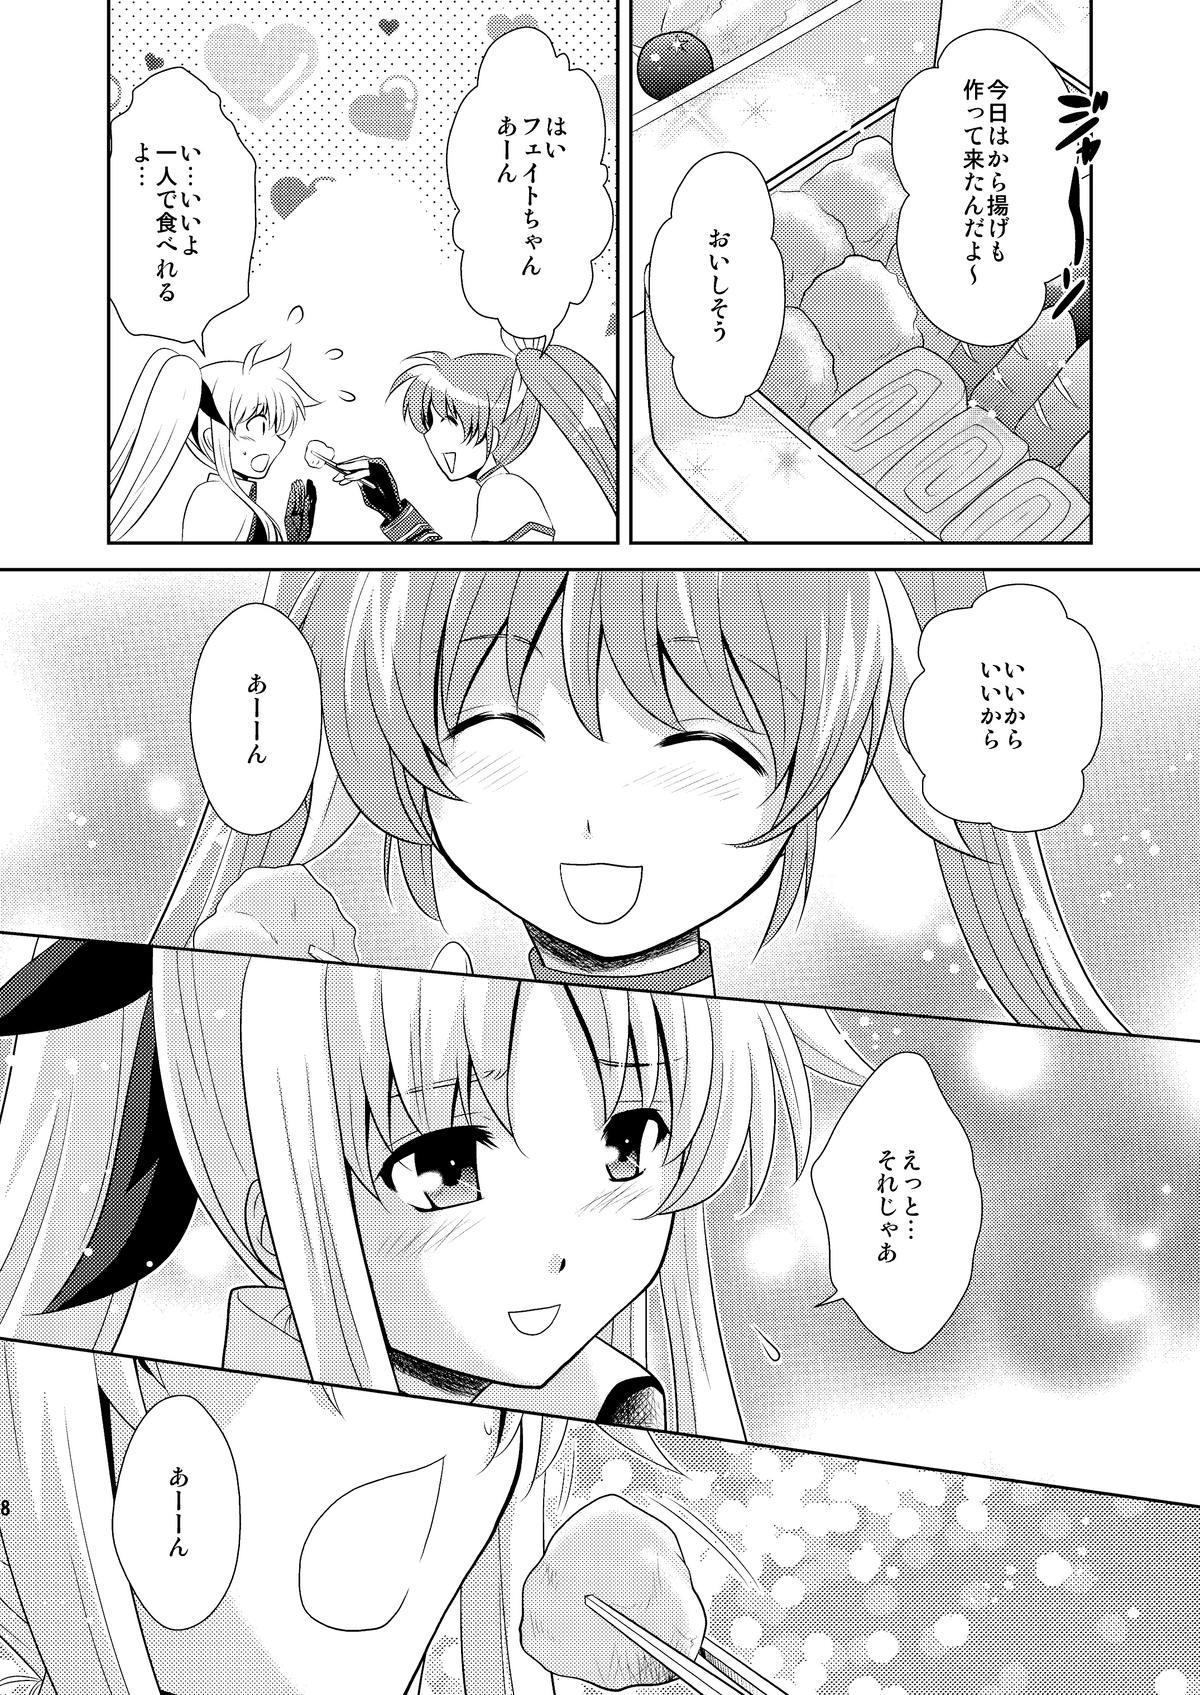 W Fate-san 7